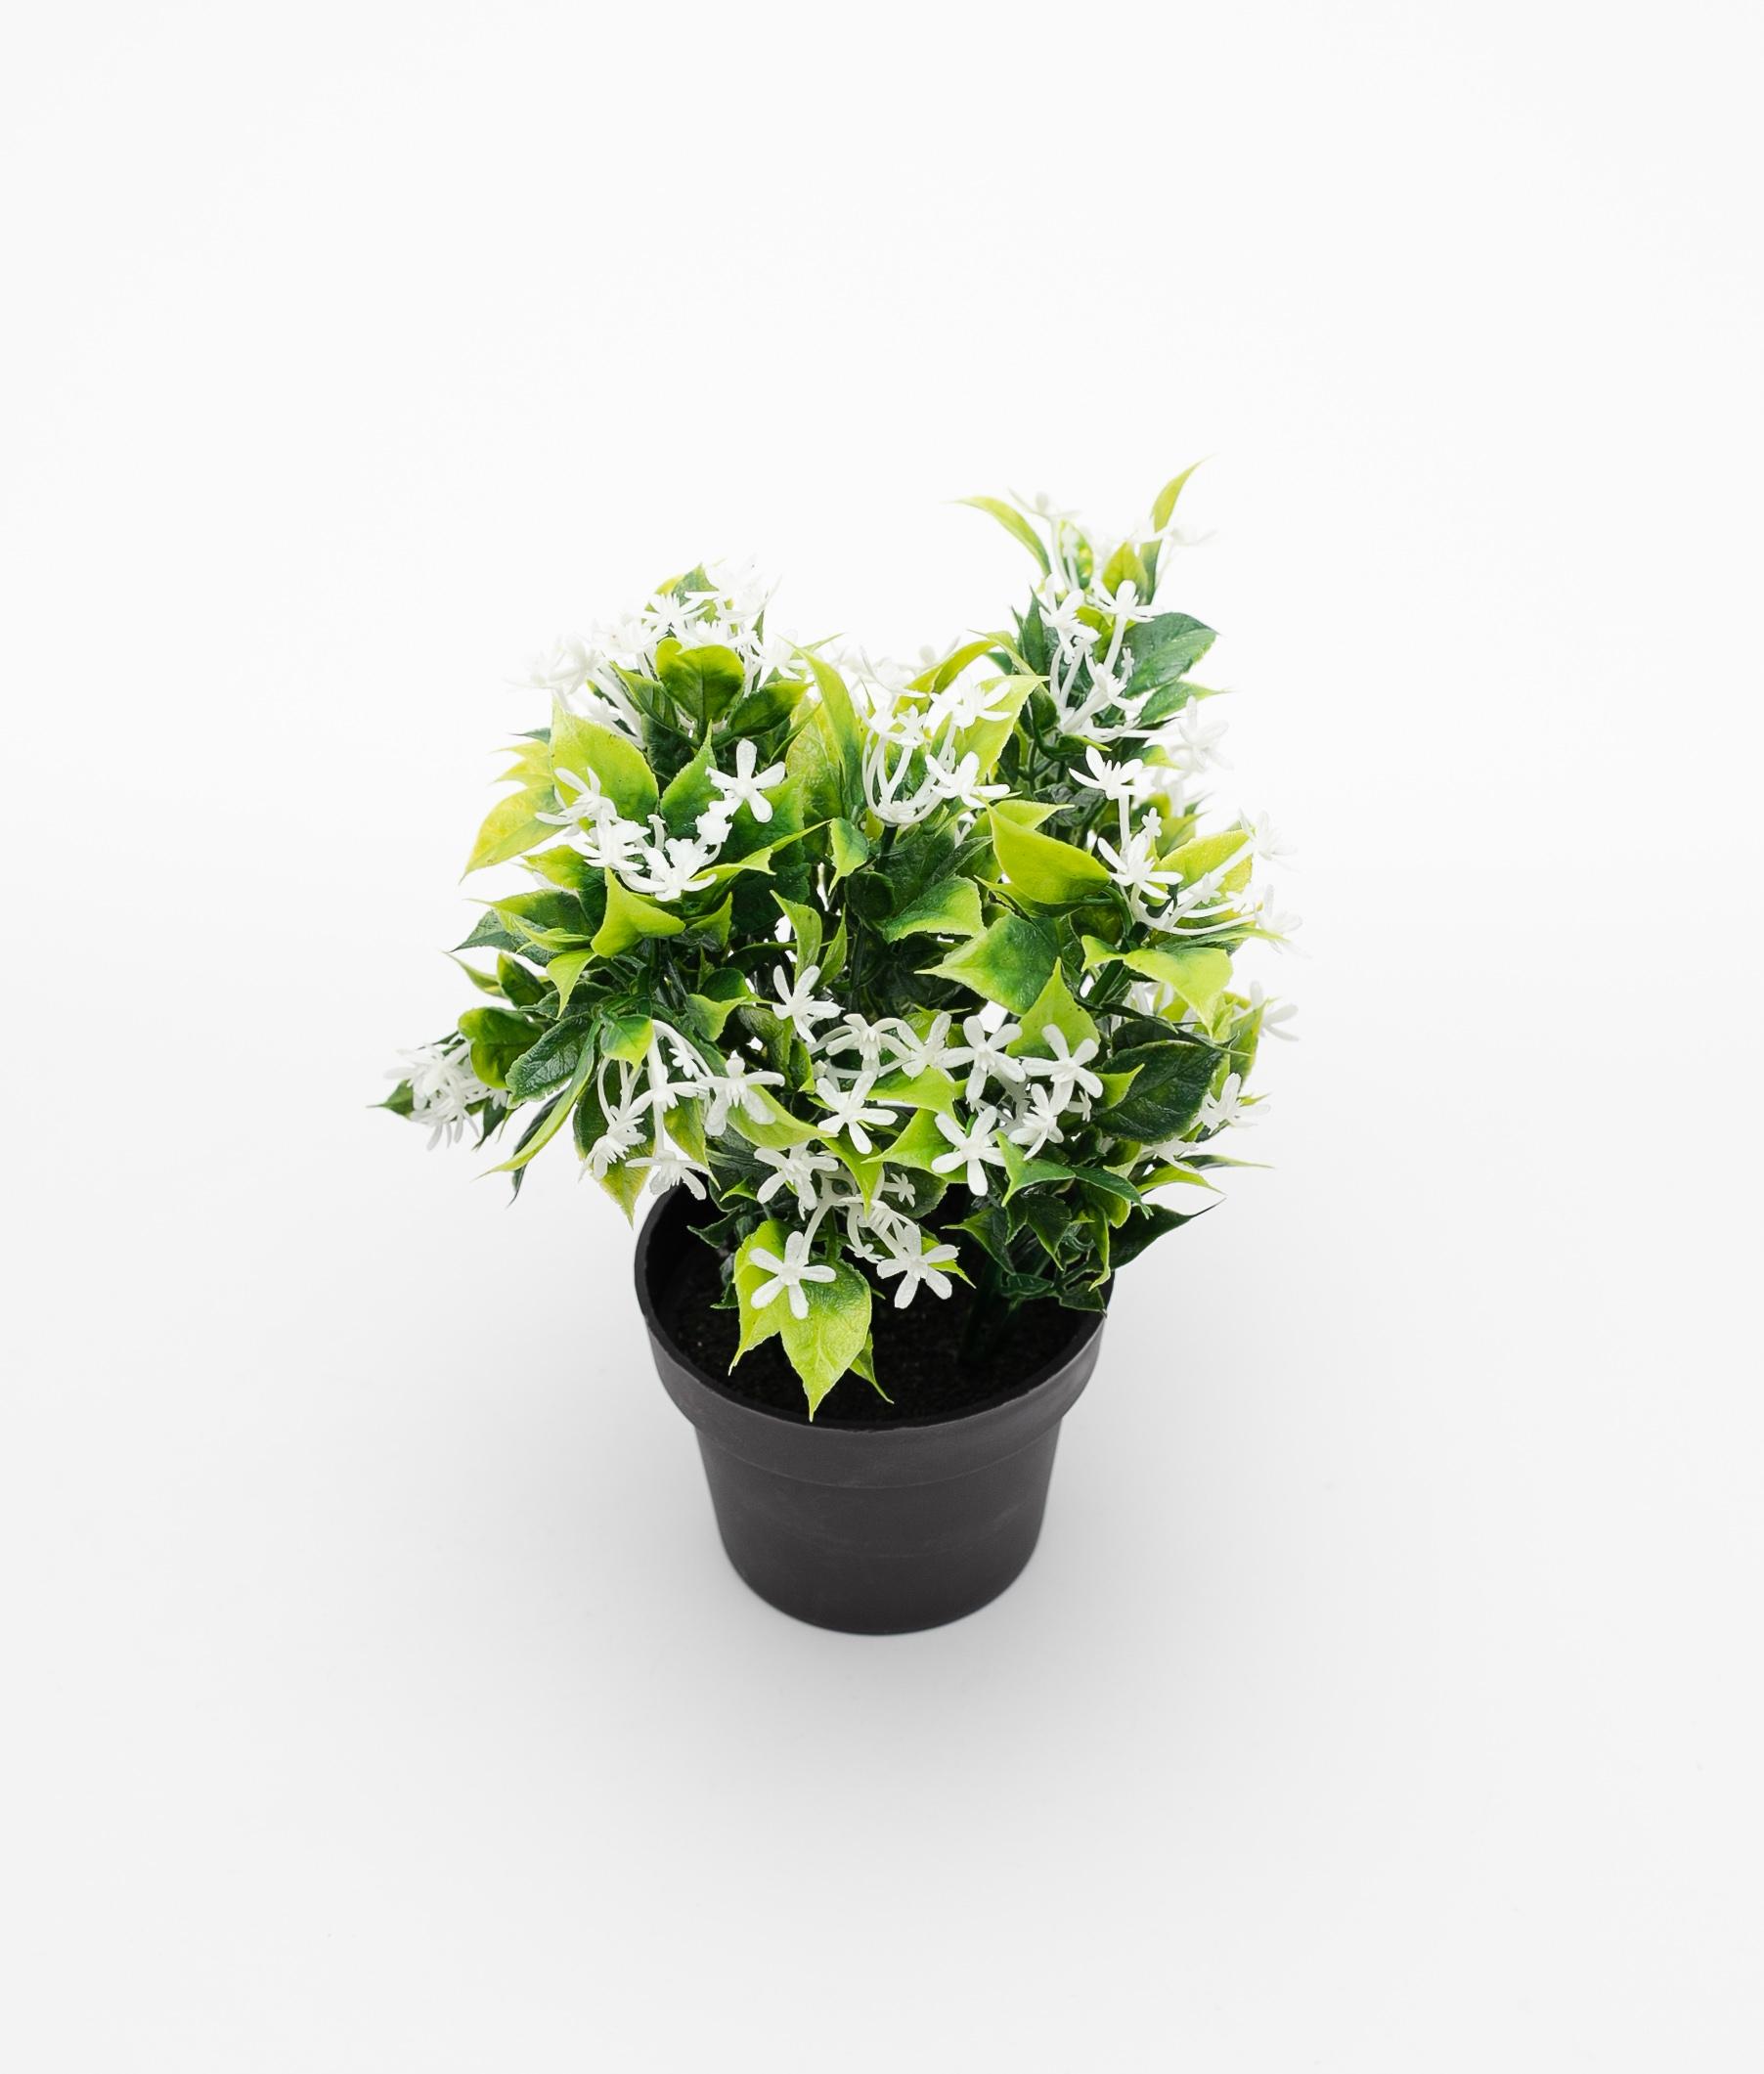 PLANTA ARTIFICIAL FLORY - GREEN